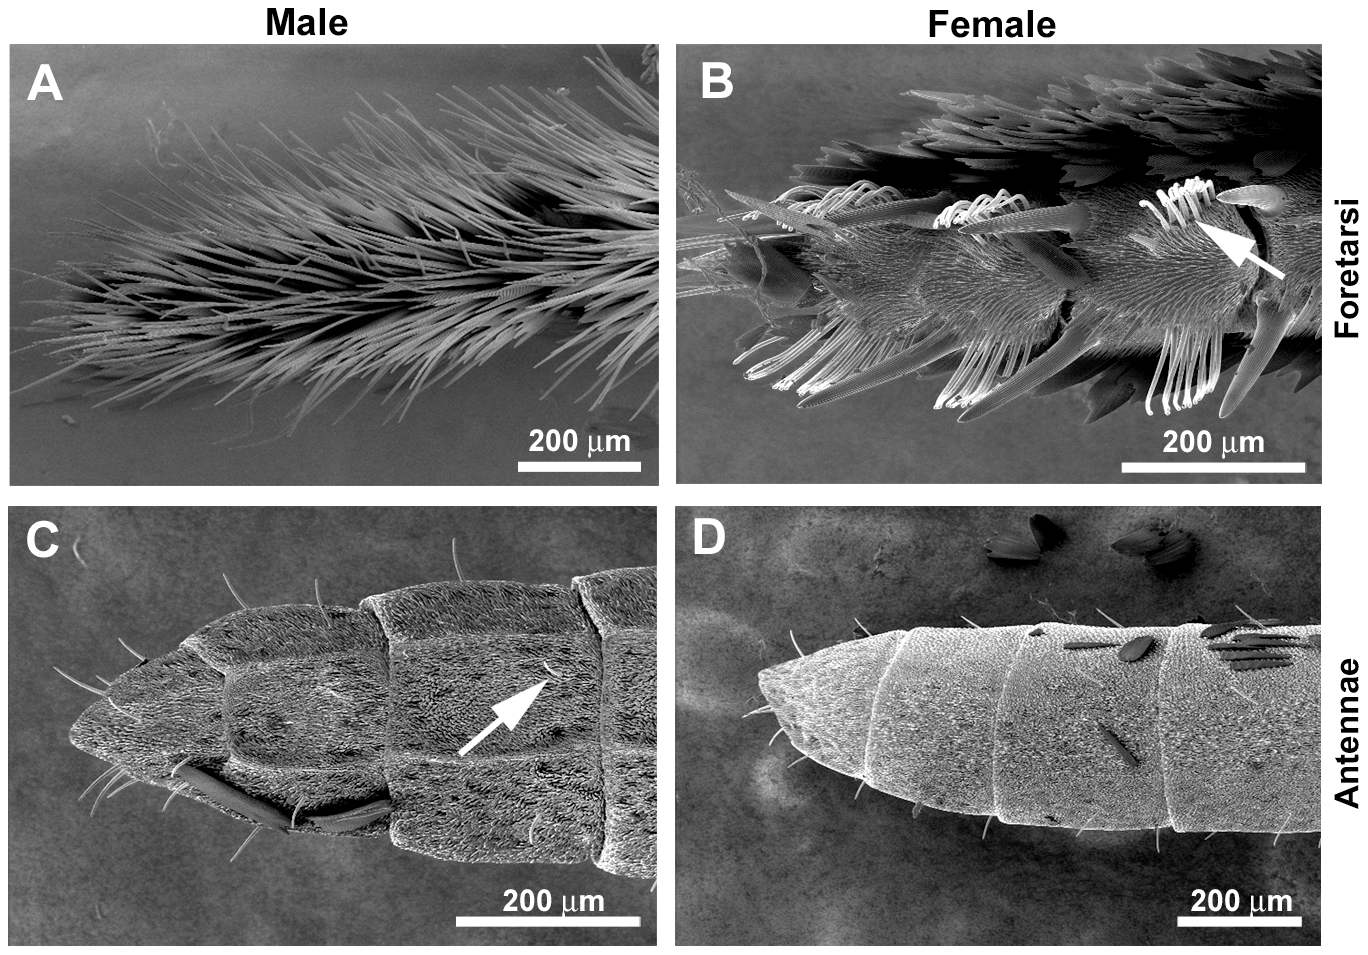 Sexual dimorphism in <i>H.</i> <i>melpomene</i> chemosensory tissues.